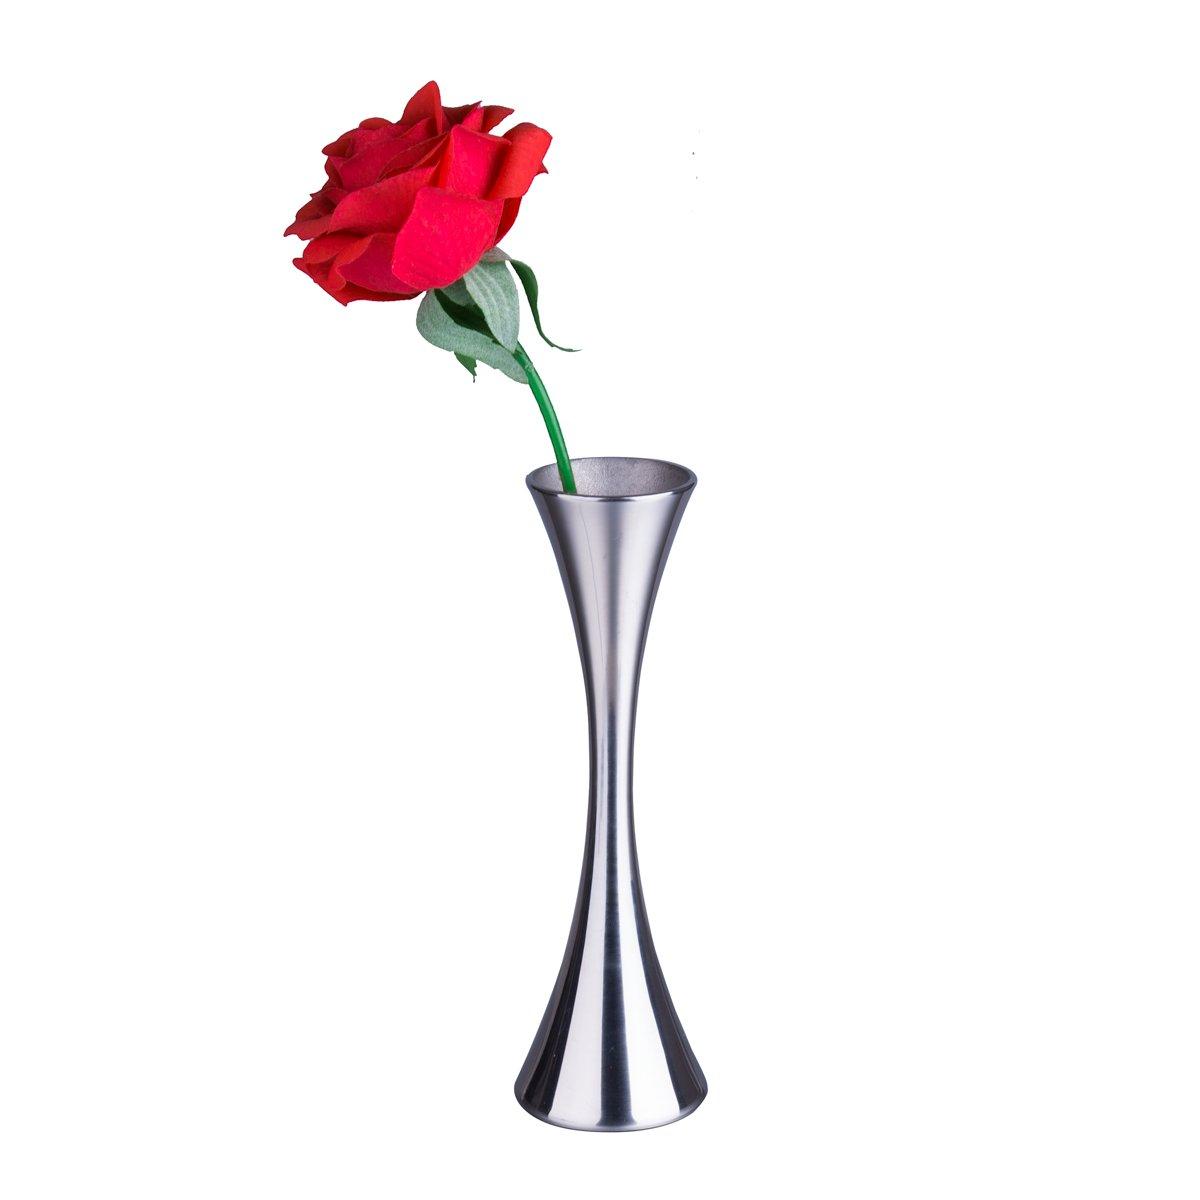 IMEEA 一輪挿し 花瓶 ミニ花瓶 ステンレス製 かわいいらし かびん スリム花瓶 花入れ 花束 飾り花瓶 シルバー B06XHGYNTH